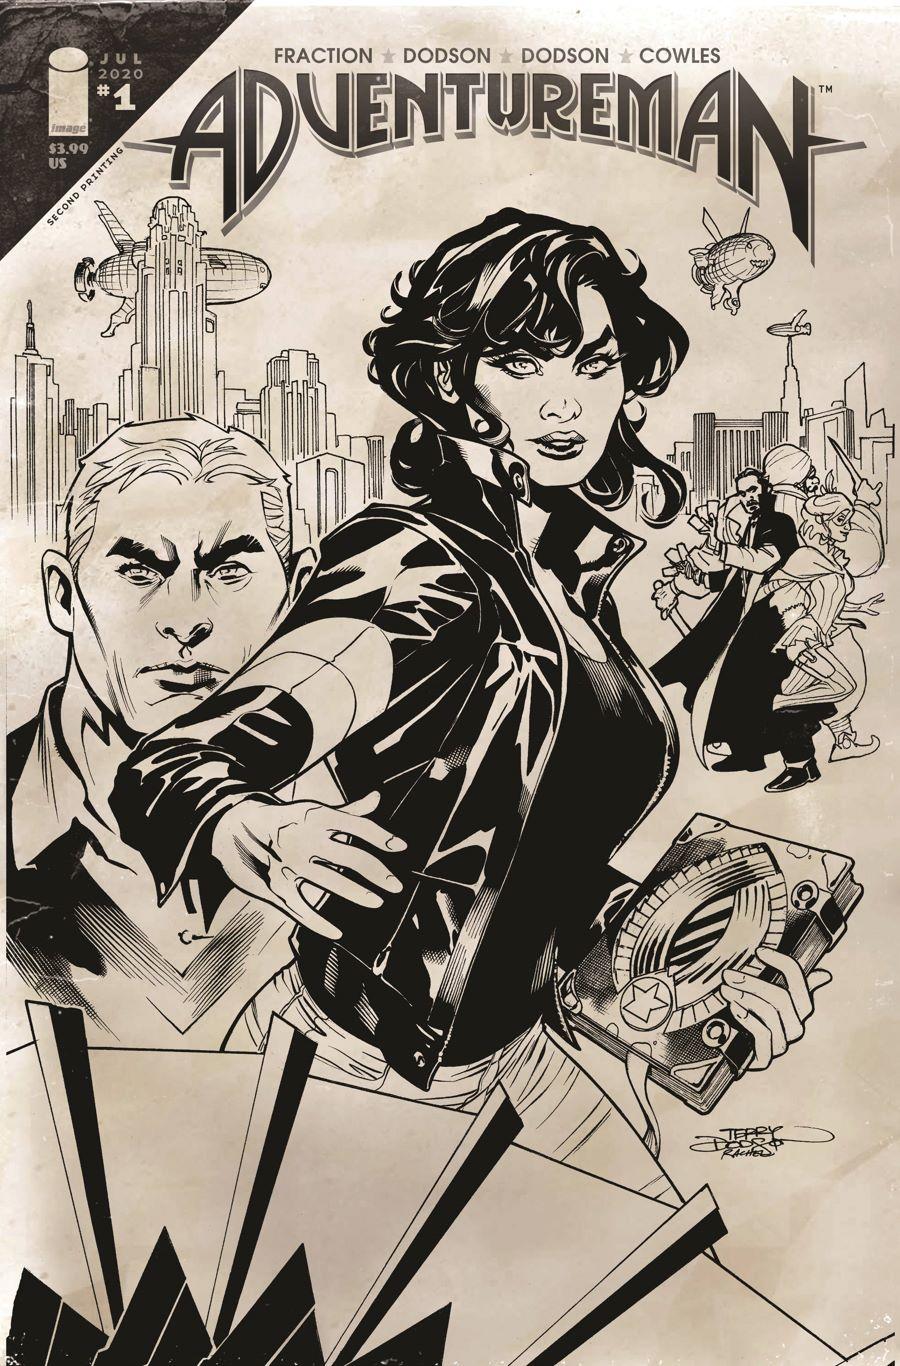 STL165258-1 ComicList: Image Comics New Releases for 07/22/2020